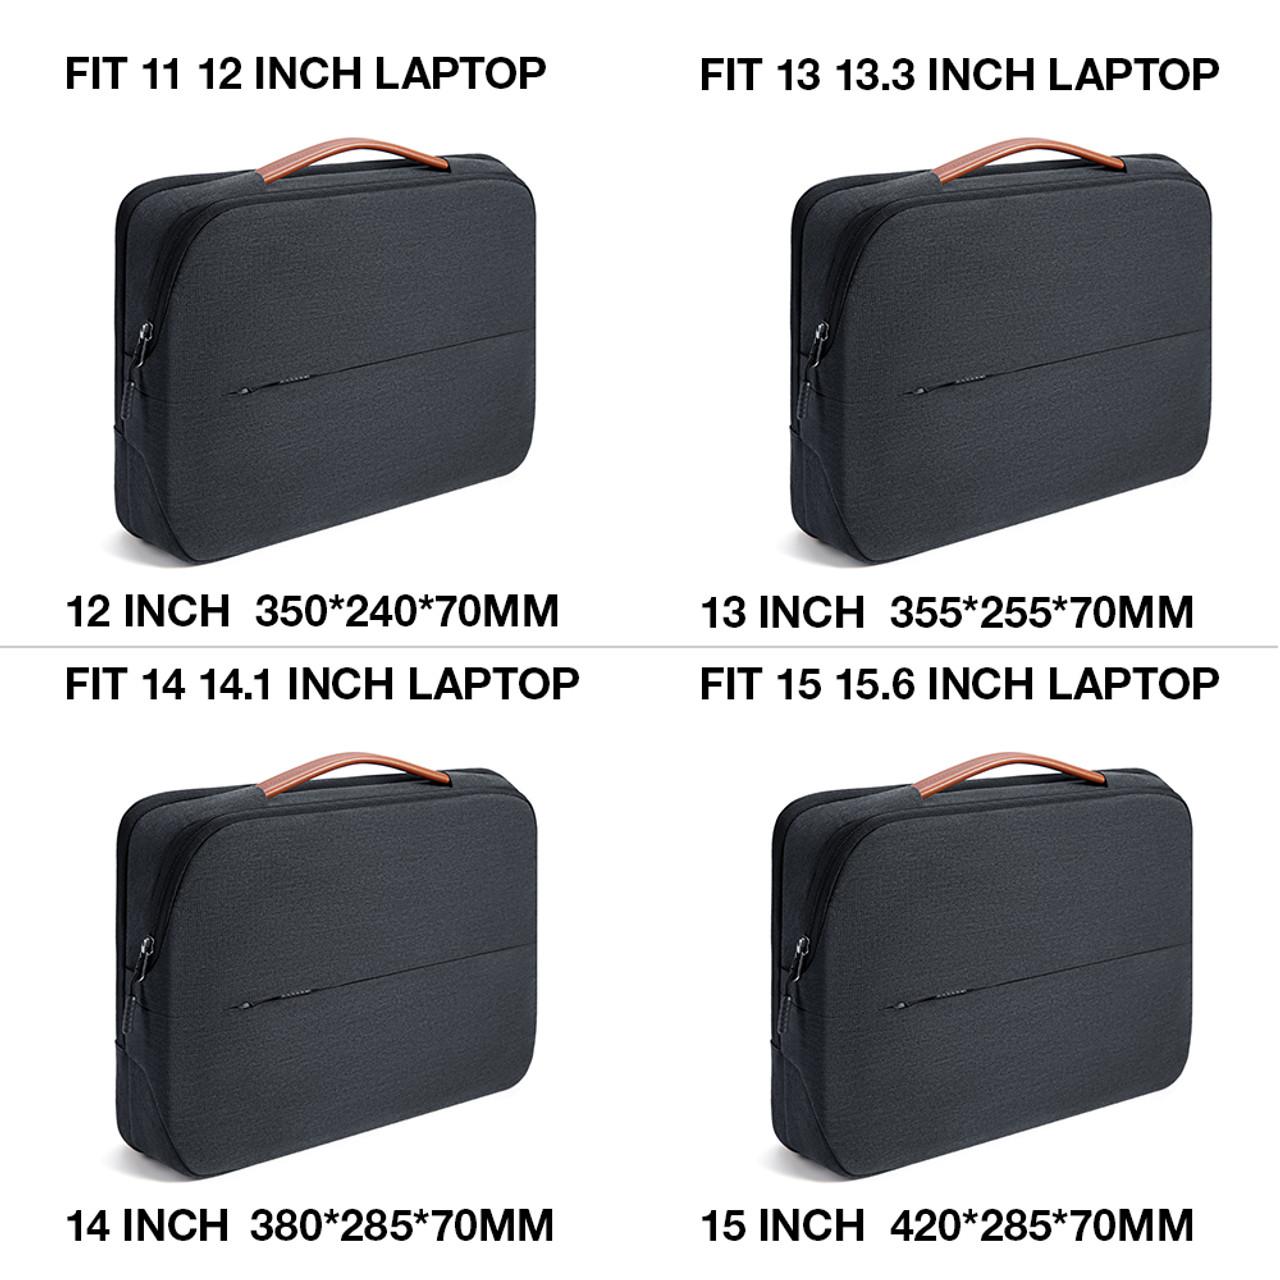 be1faf8eec205 ... KALIDI Laptop Bag 11 12 13.3 14 15.6 Inch Waterproof Notebook Bag 15  15.6 Inch For ...